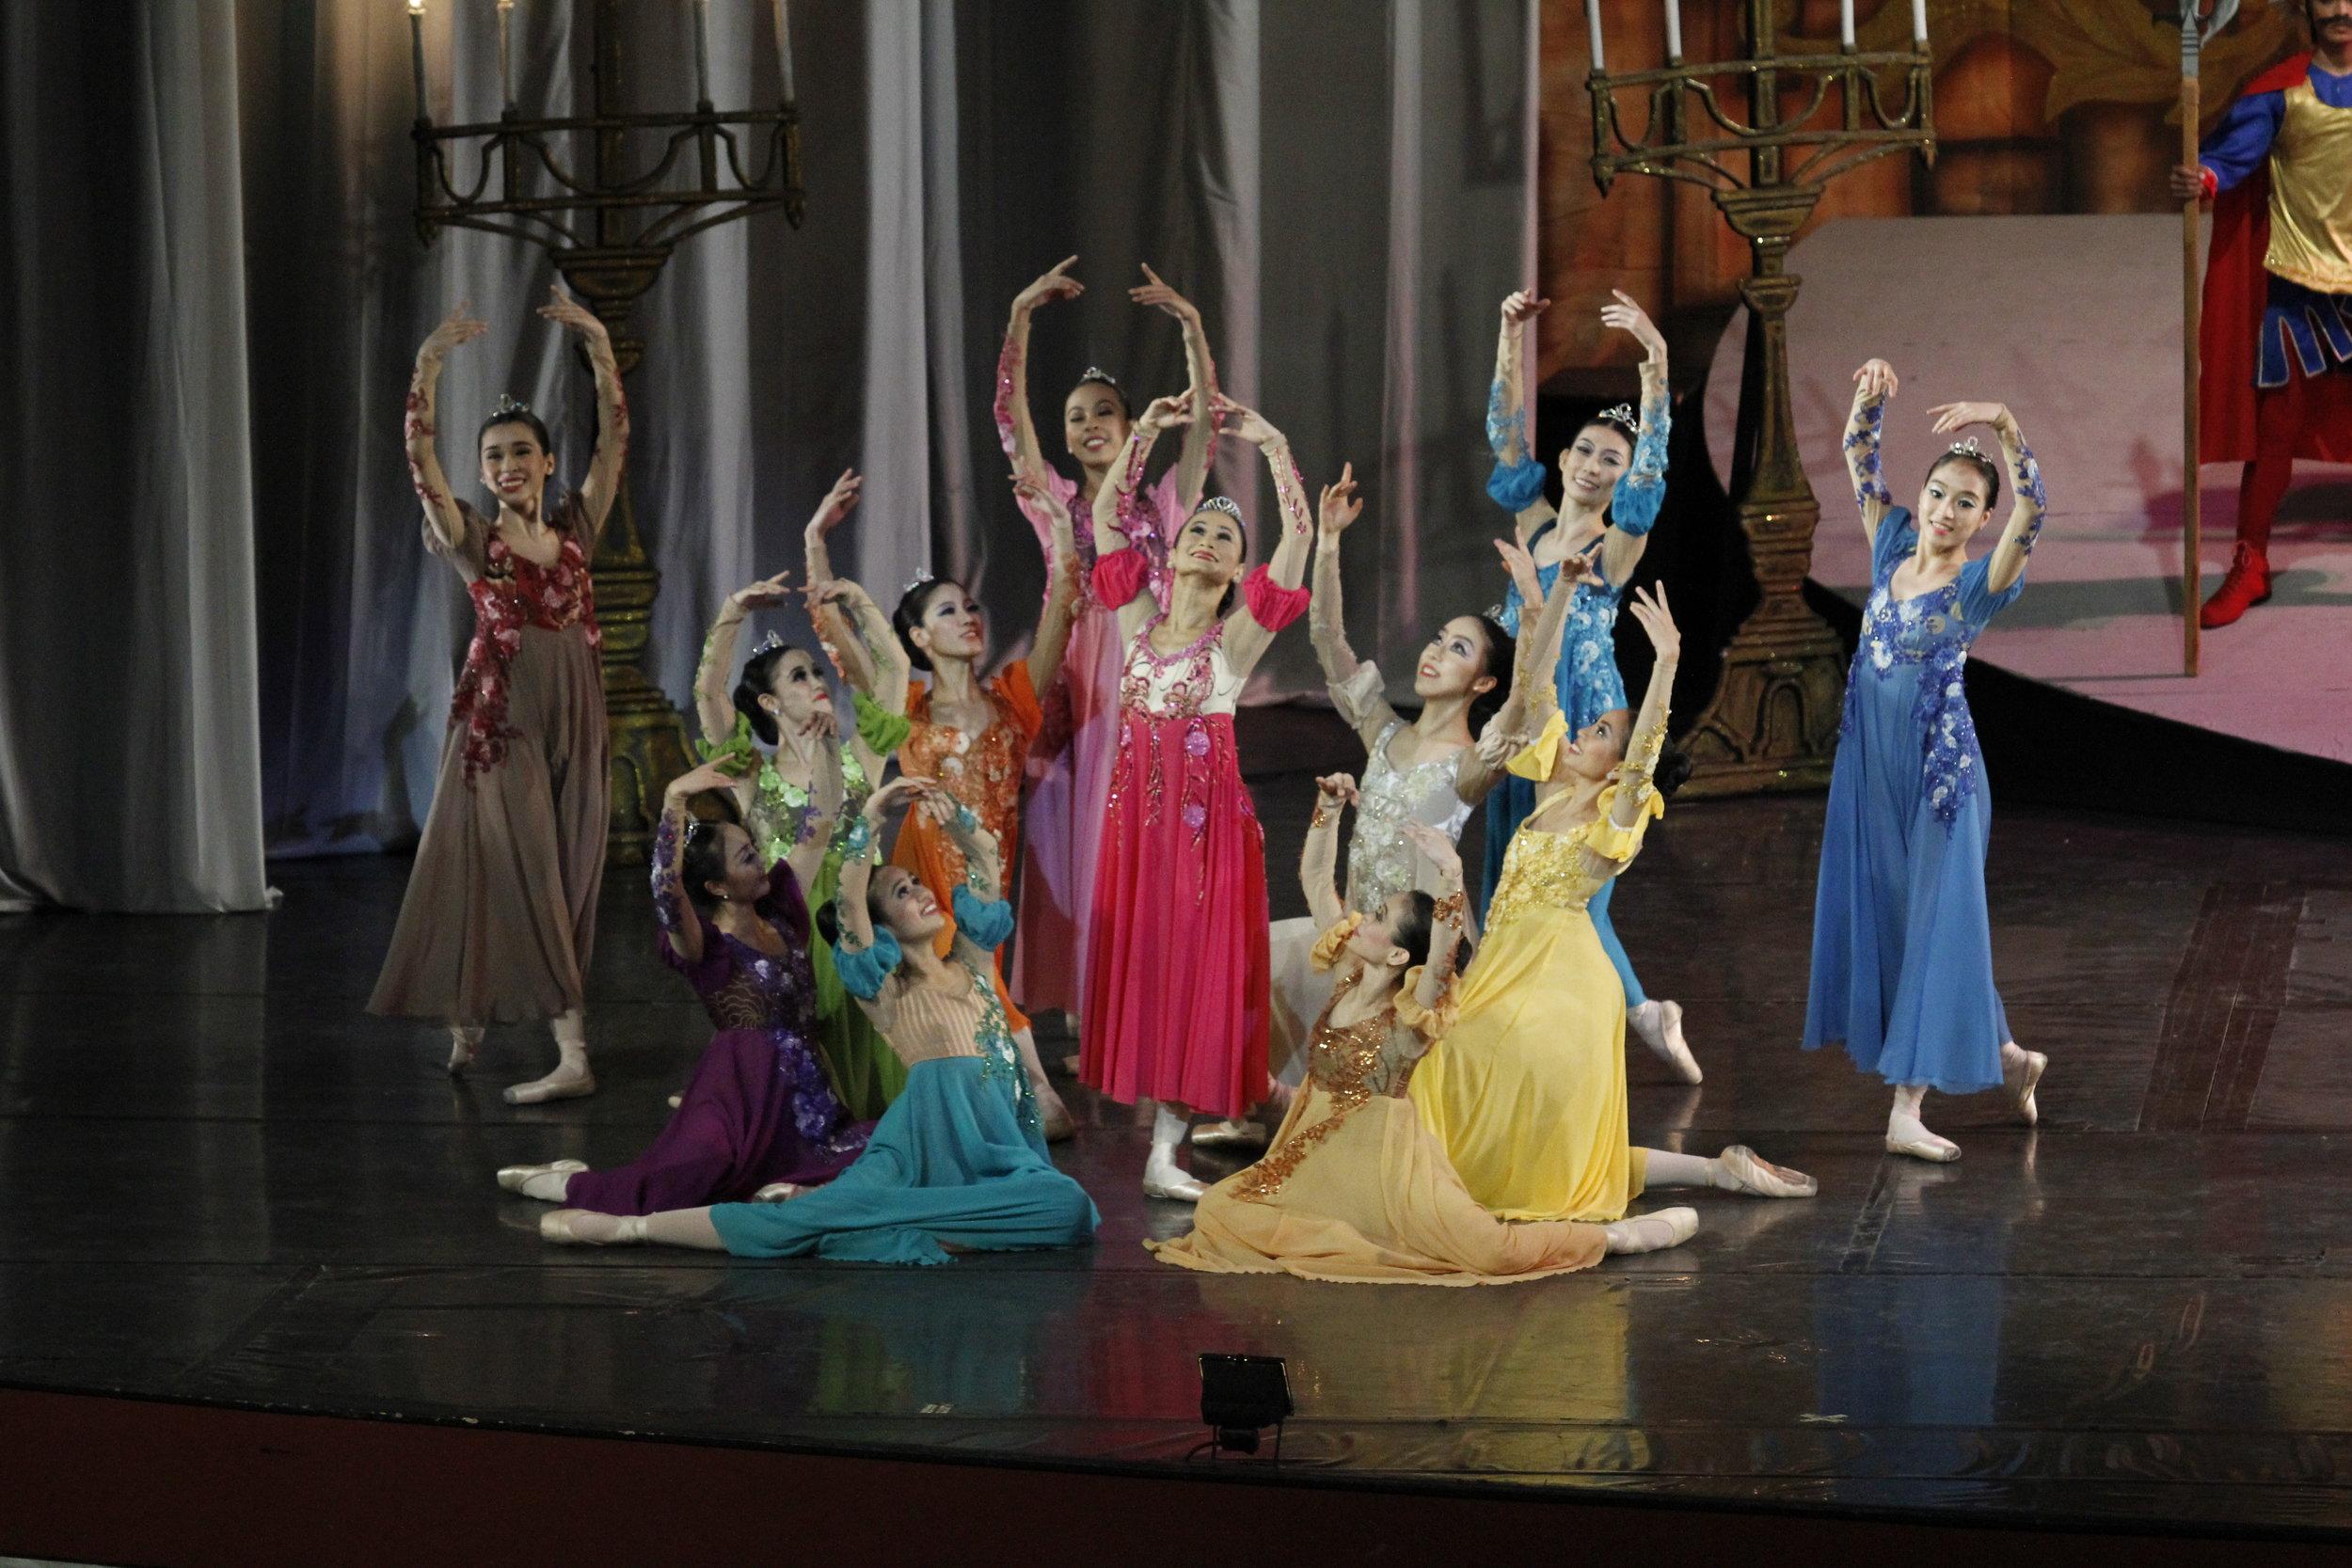 Aside from choreographing  Labingdalawang Masasayang Prinsesa,  Lisa Macuja-Elizalde (standing, center) also danced as one of the princesses. Photo by Ocs Alvarez